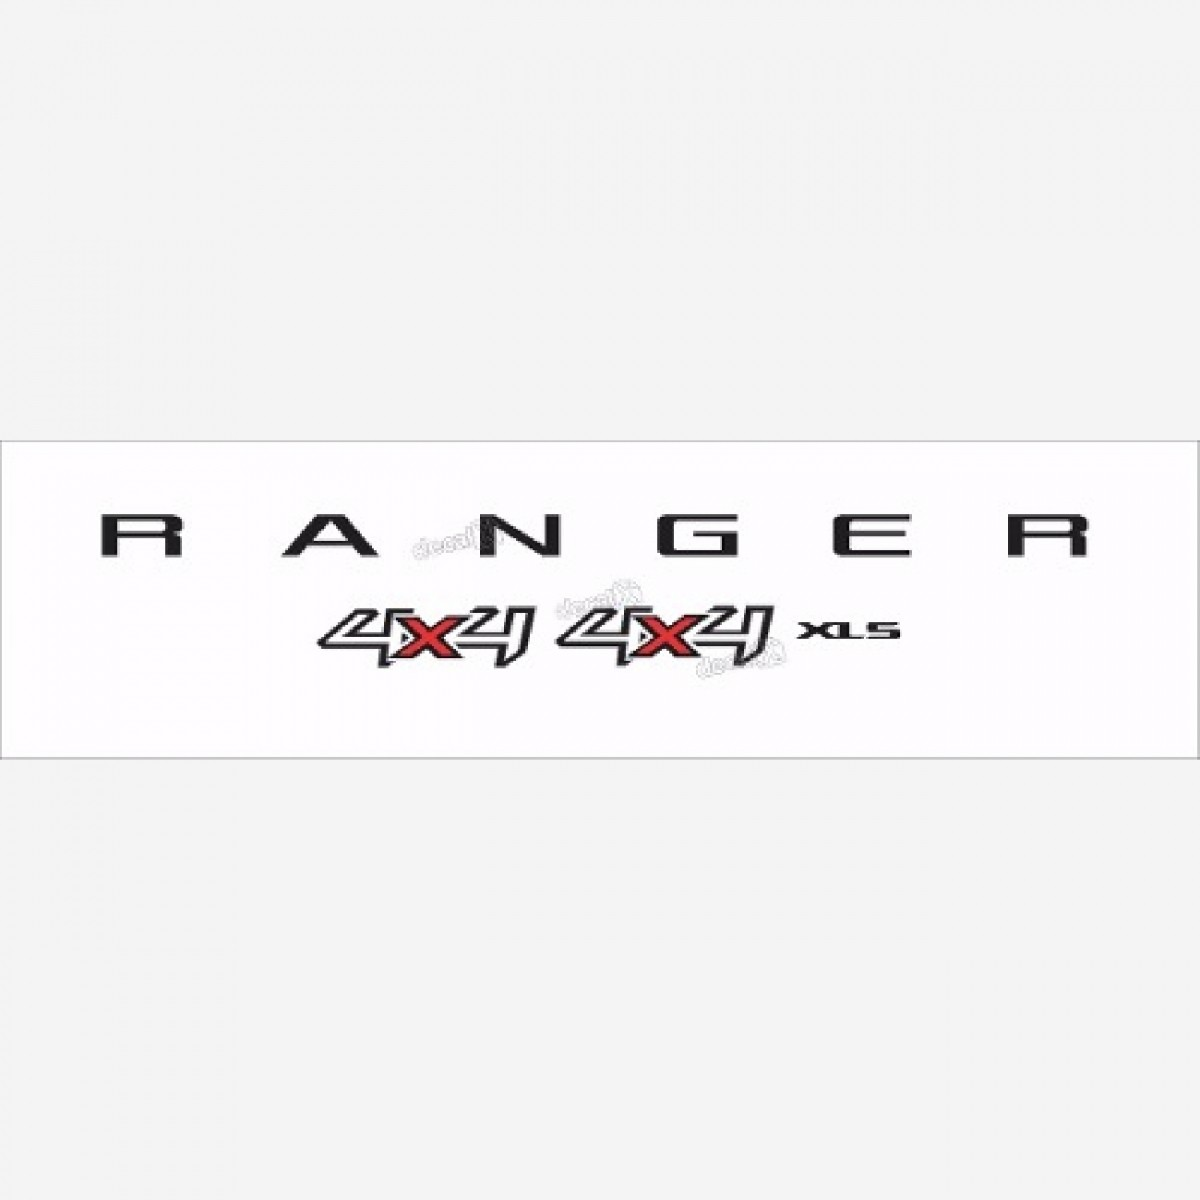 Emblema Adesivo Ford Ranger Xls 4x4 2013 Cam. Branca